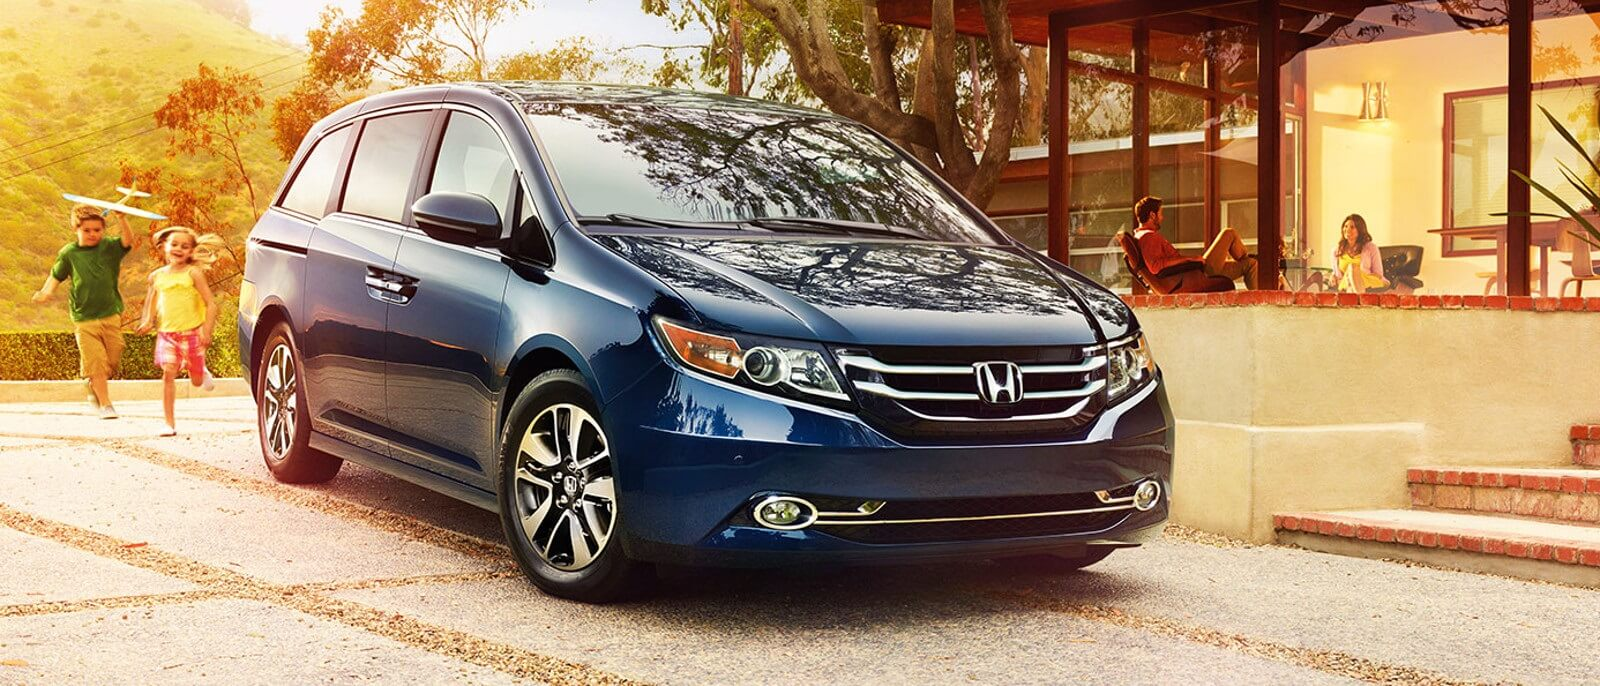 2016 Honda Odyssey in blue